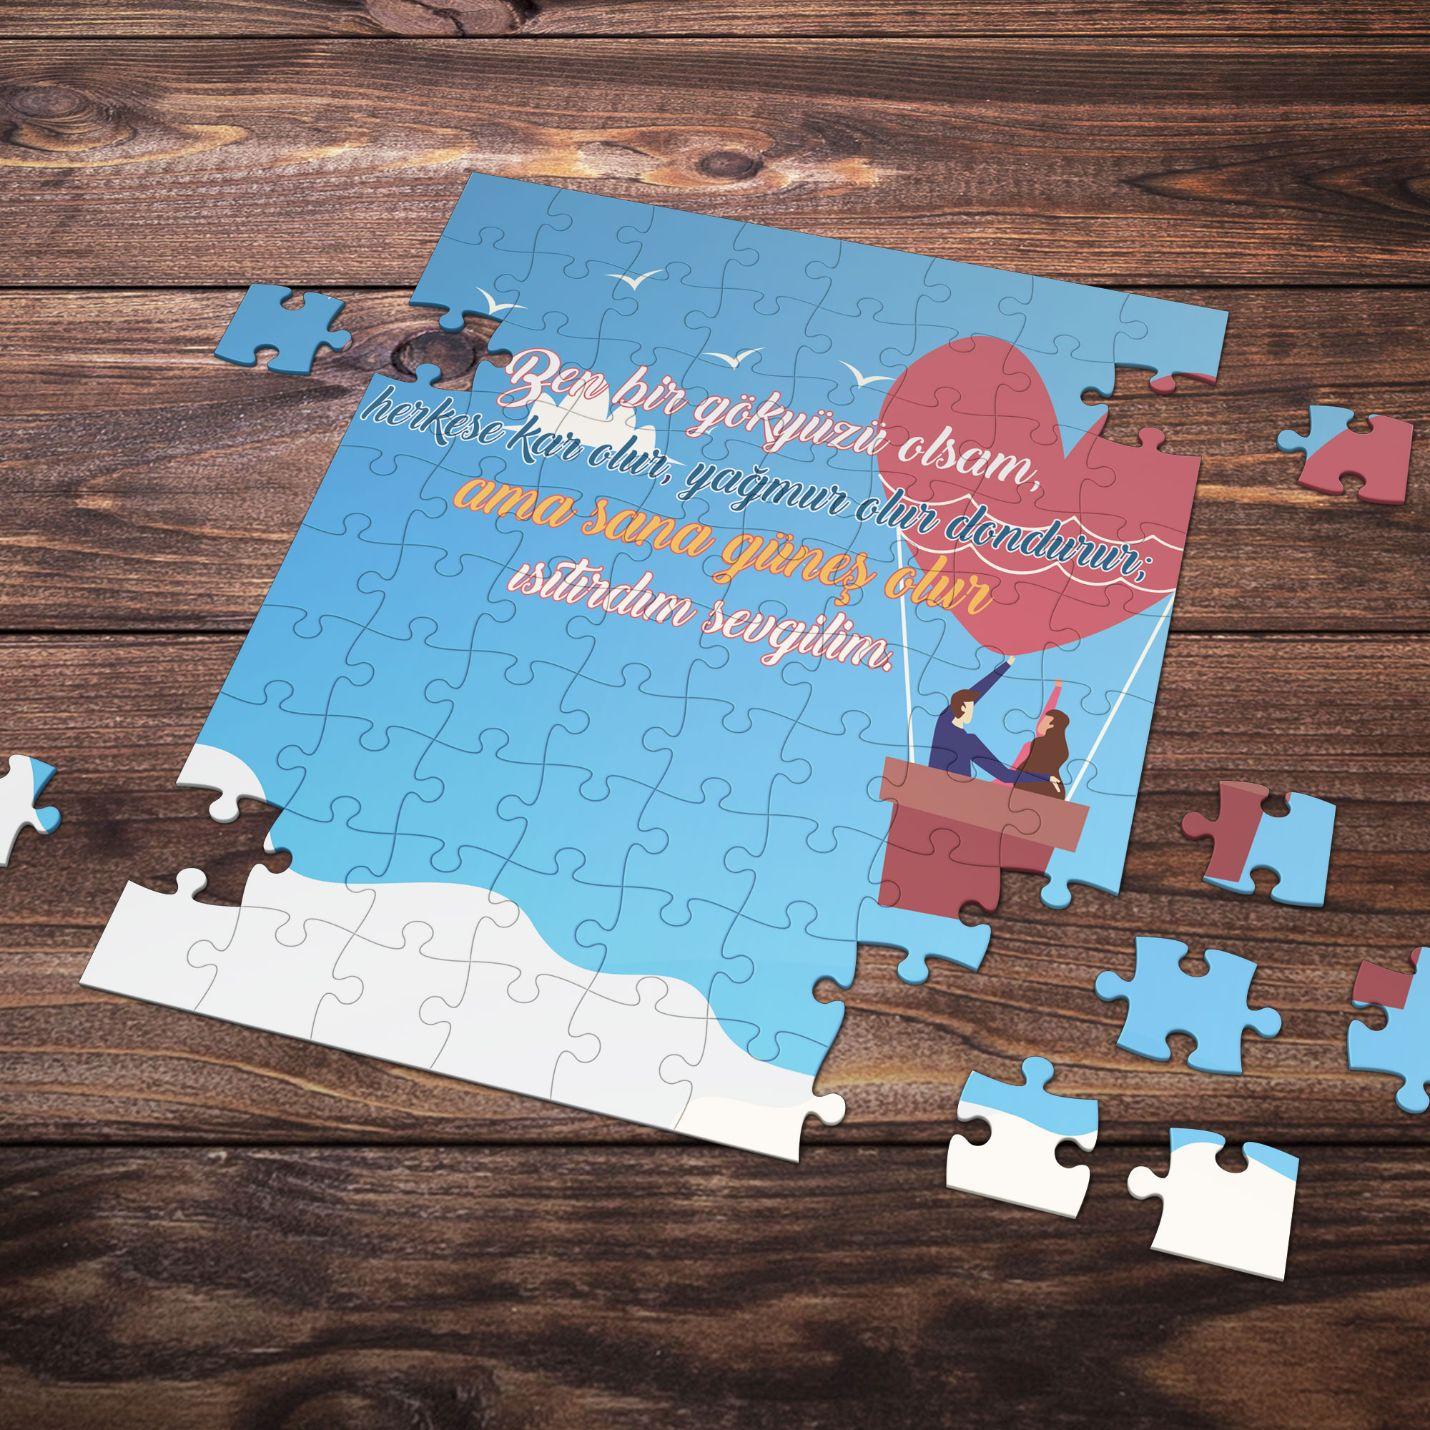 99 Parça Romantik Tasarımlı Puzzle Yapboz No2